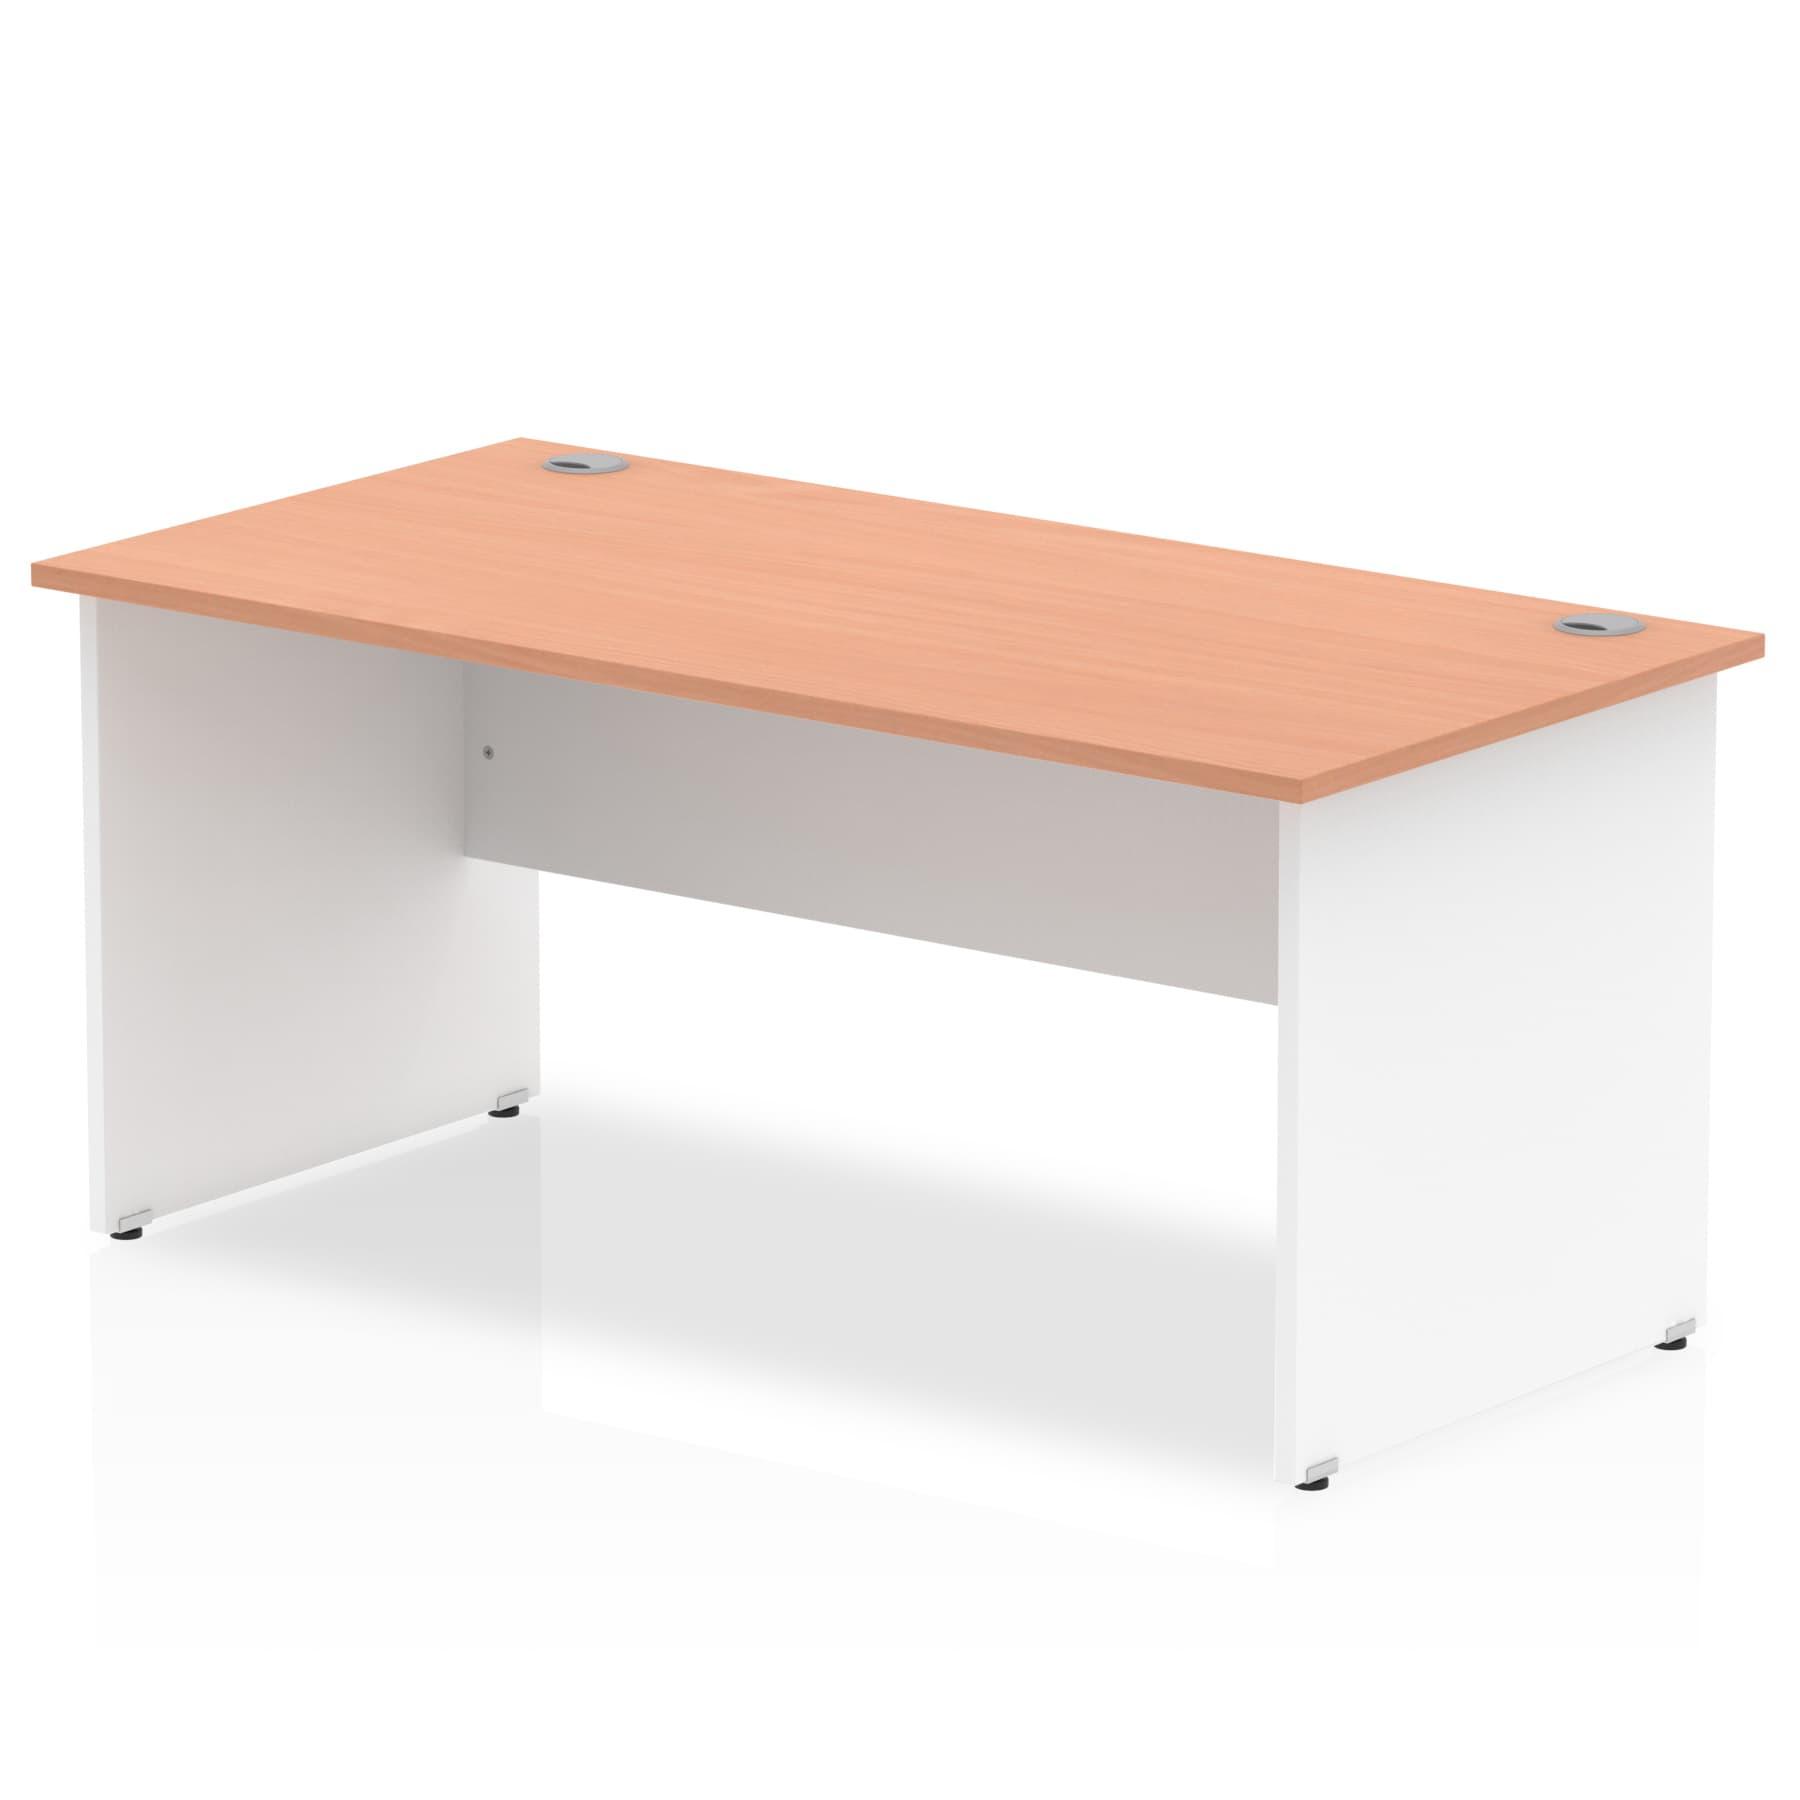 Impulse Panel End 1800 Rectangle Desk with White Panels